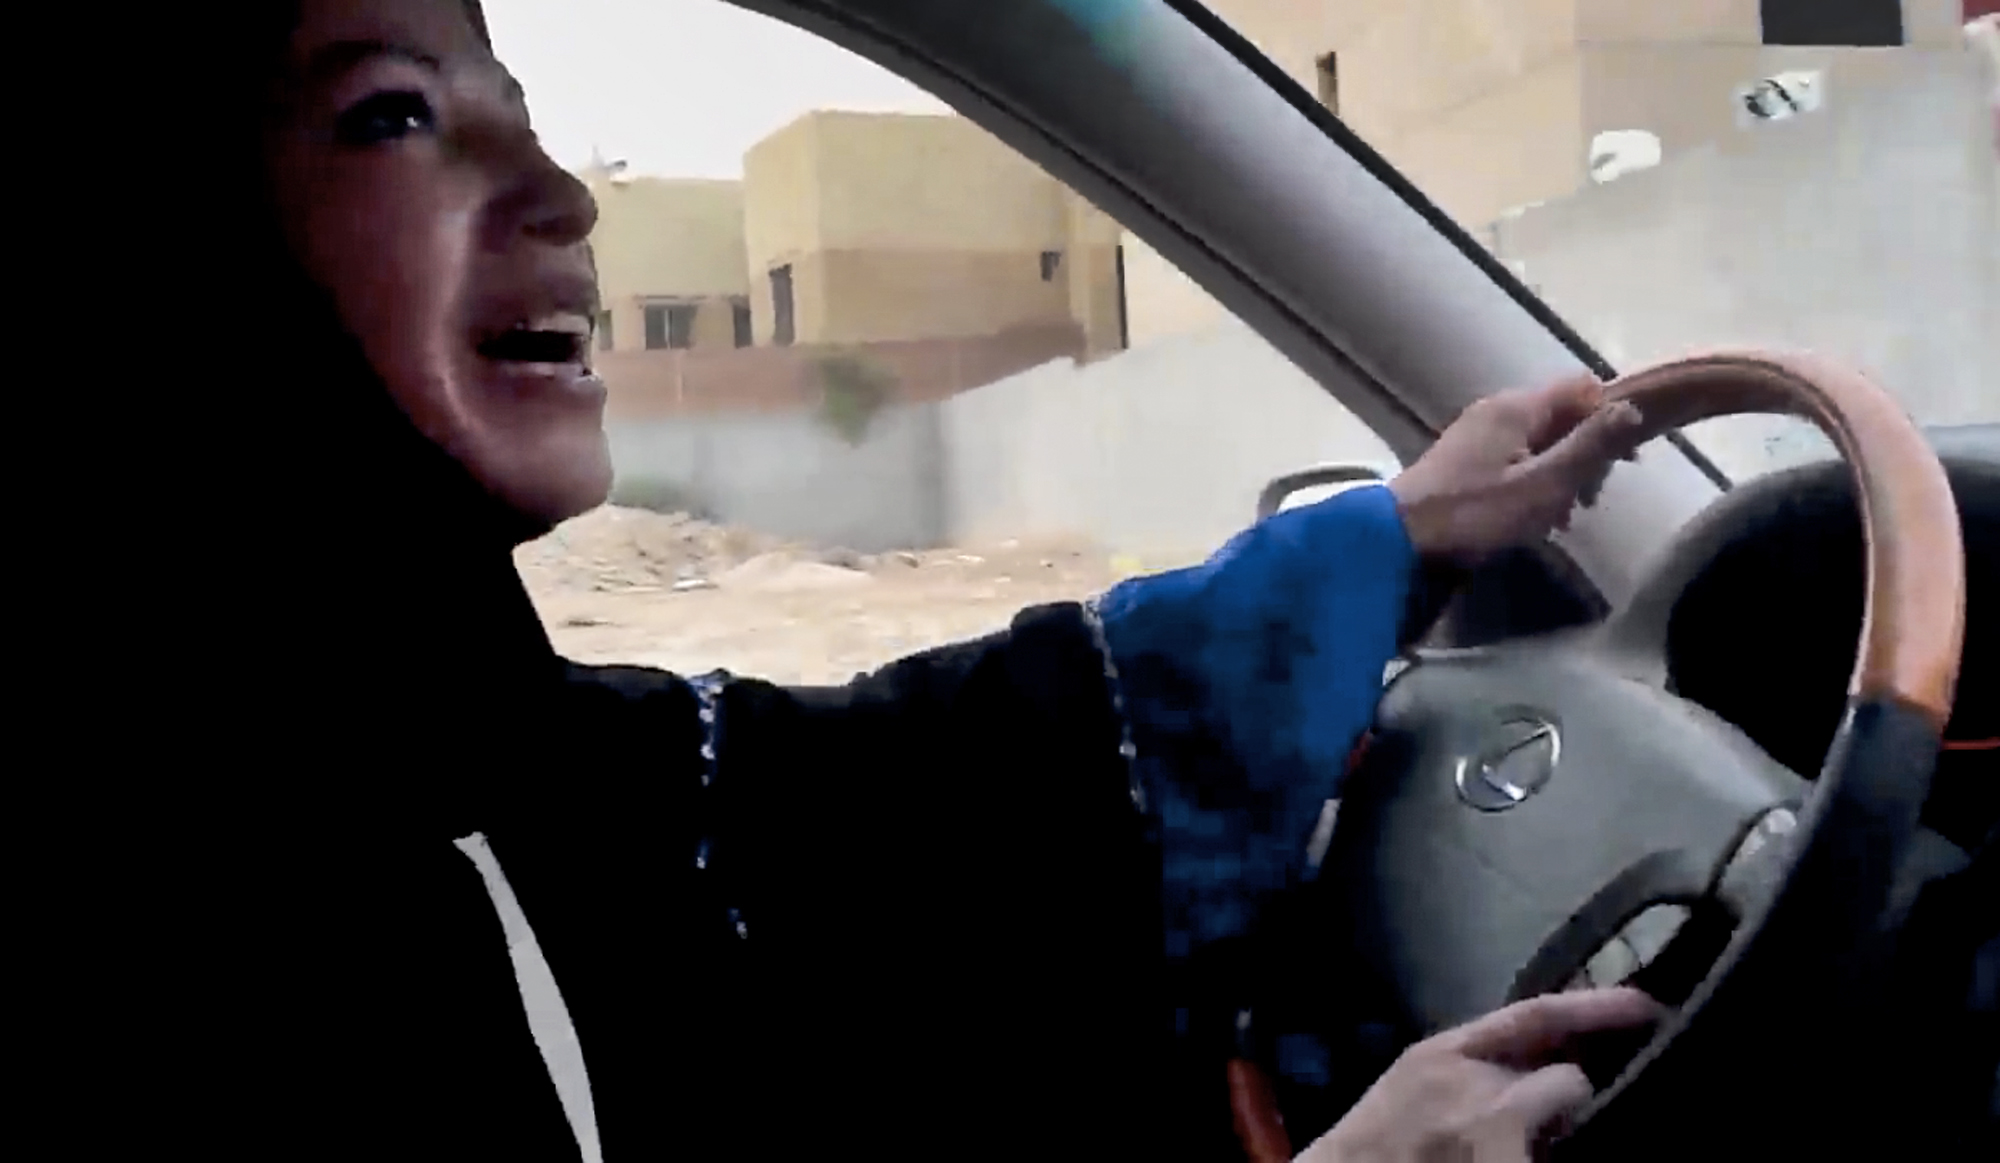 Saudi Arabia Overturns Ban That Kept Women from Driving